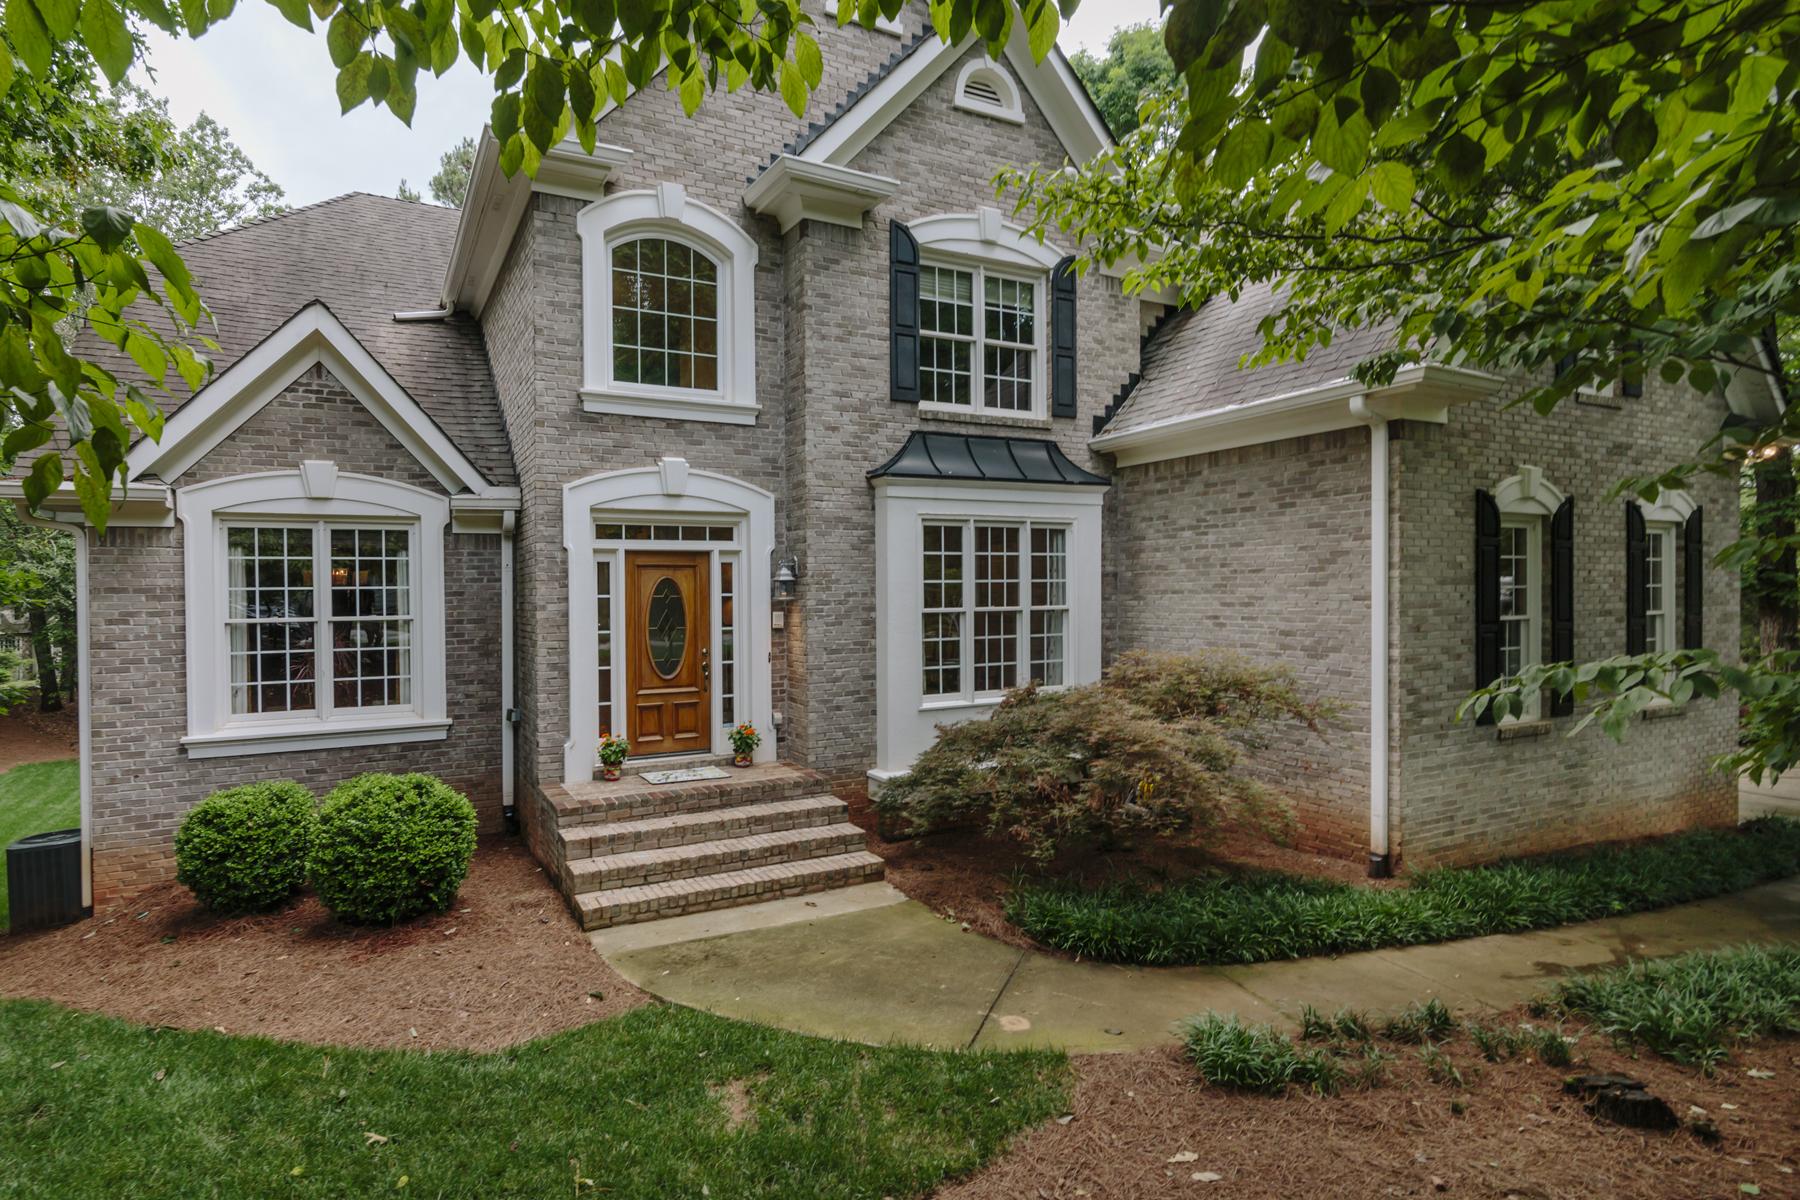 獨棟家庭住宅 為 出售 在 Surprising Home In Sought After Community 340 N Peak Drive Alpharetta, 喬治亞州, 30022 美國